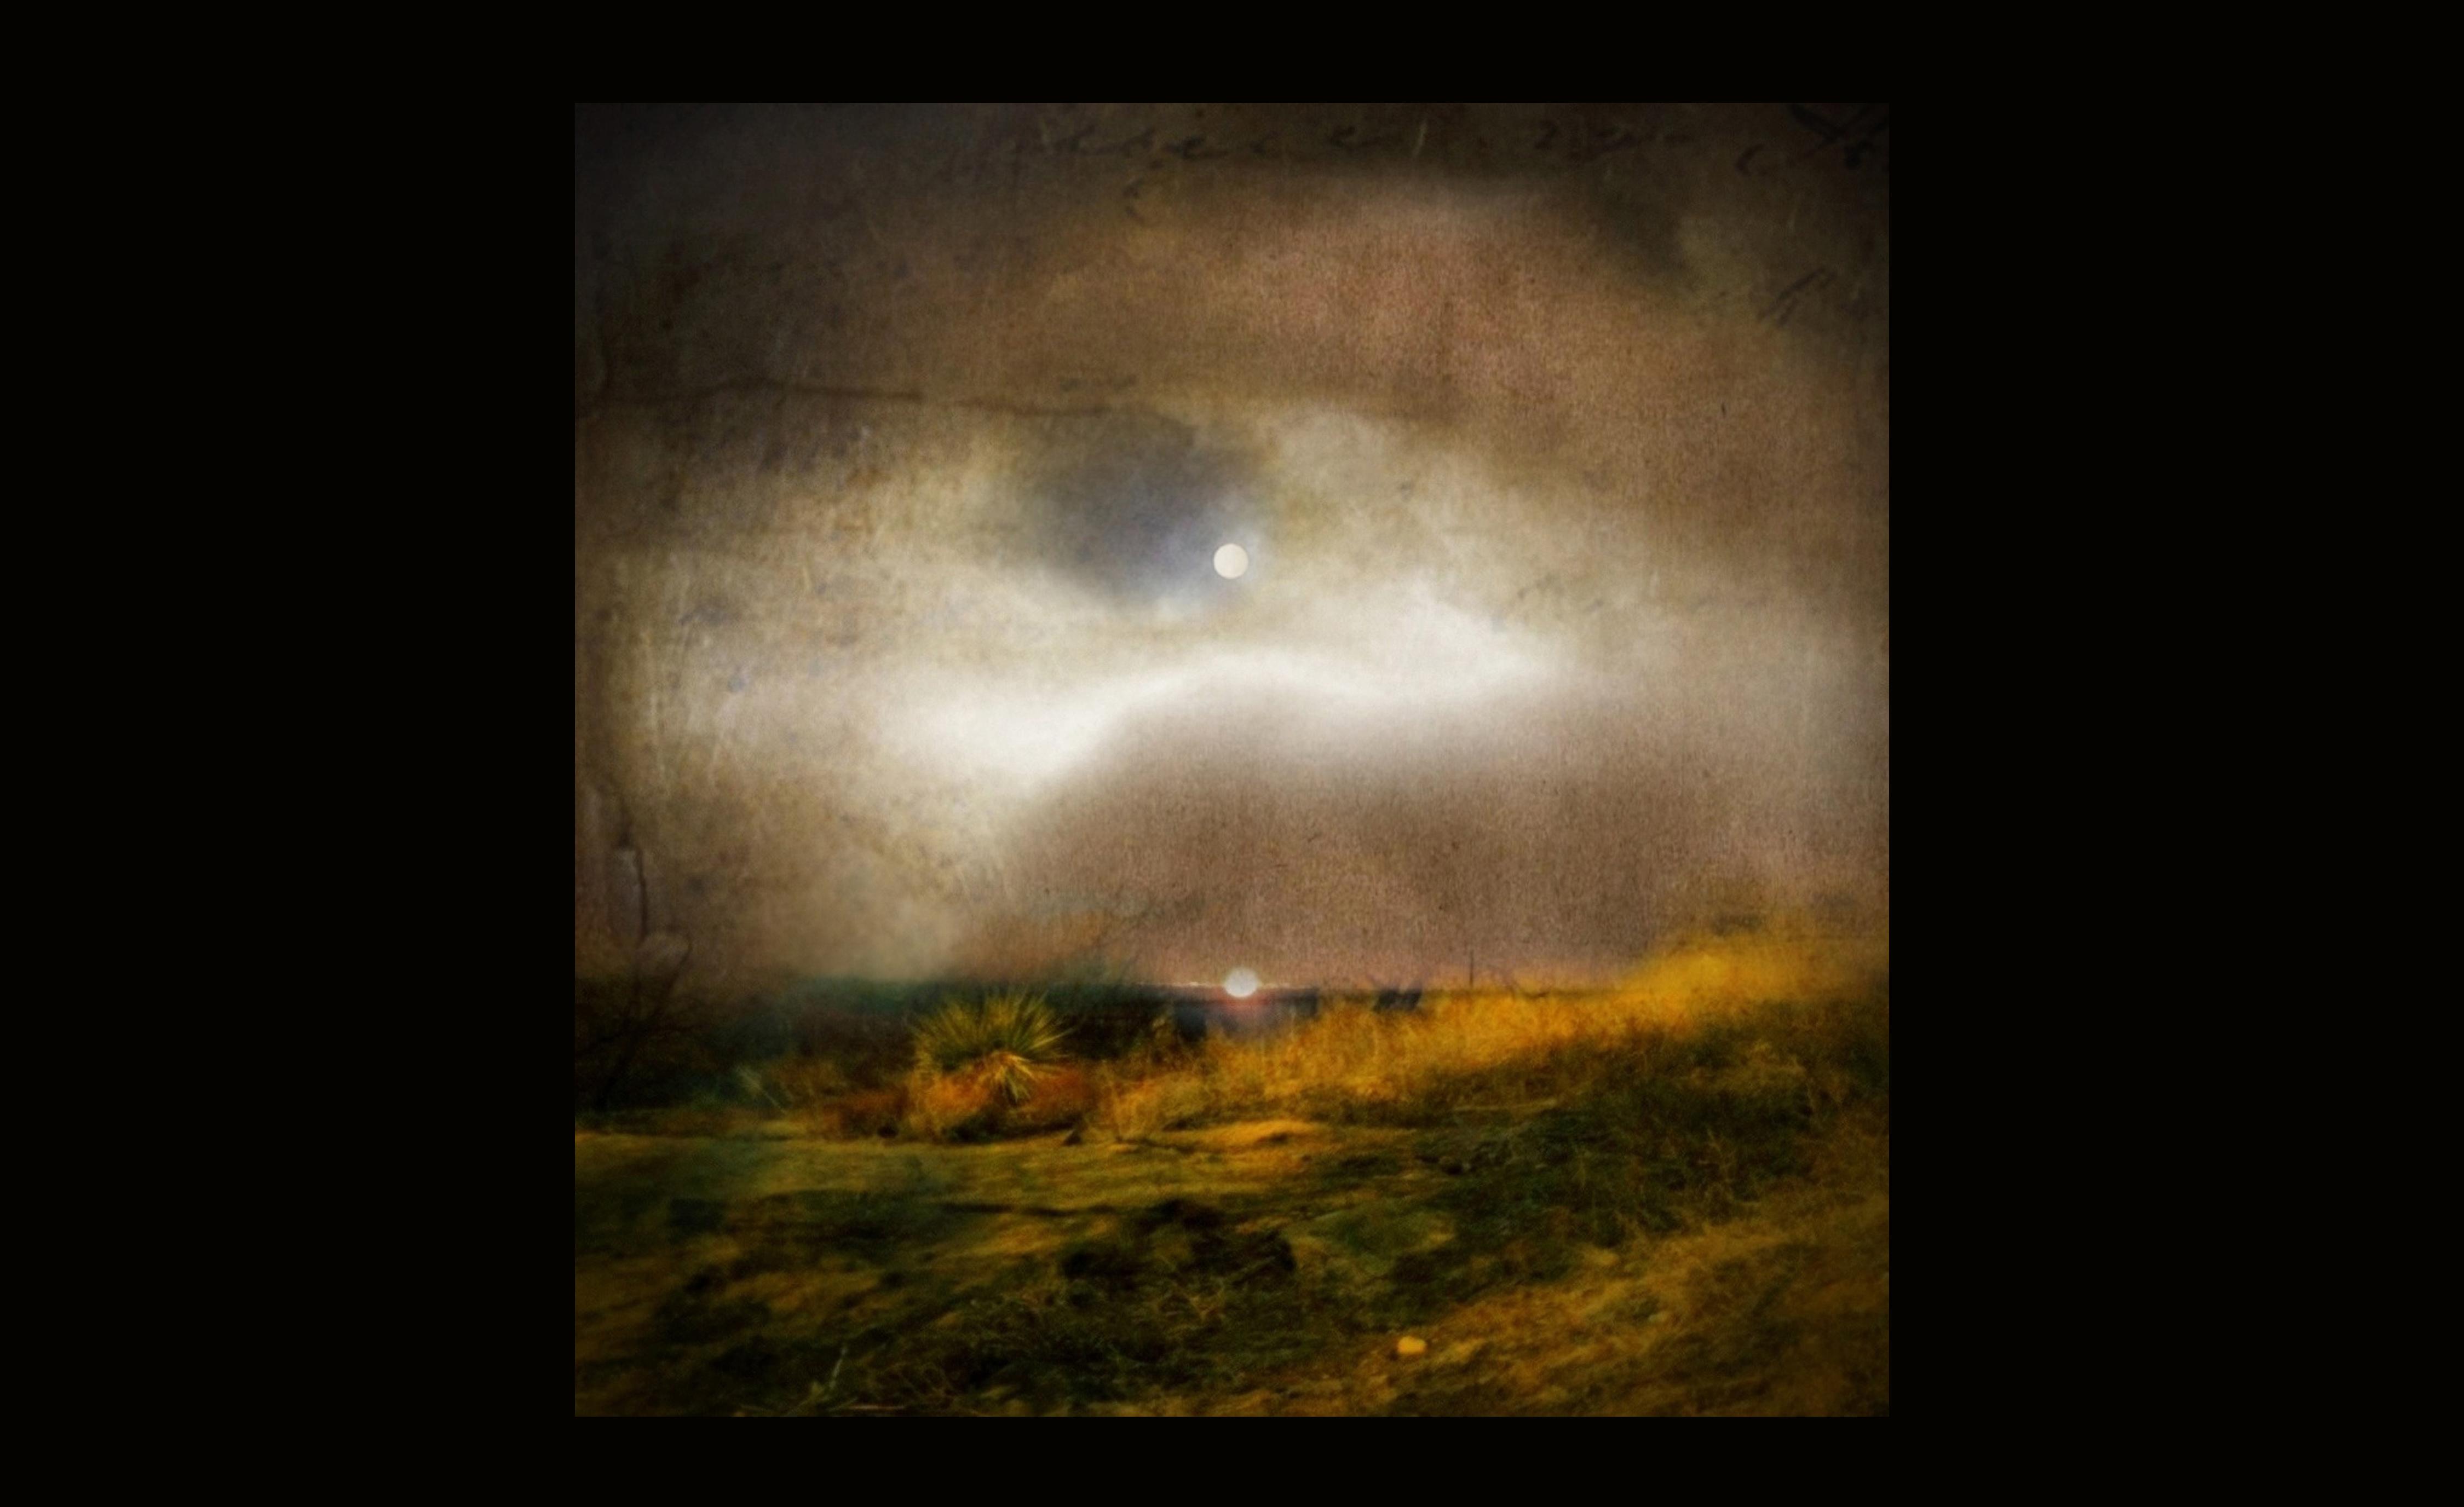 IMG_1887-OrbitalDream-Maureen